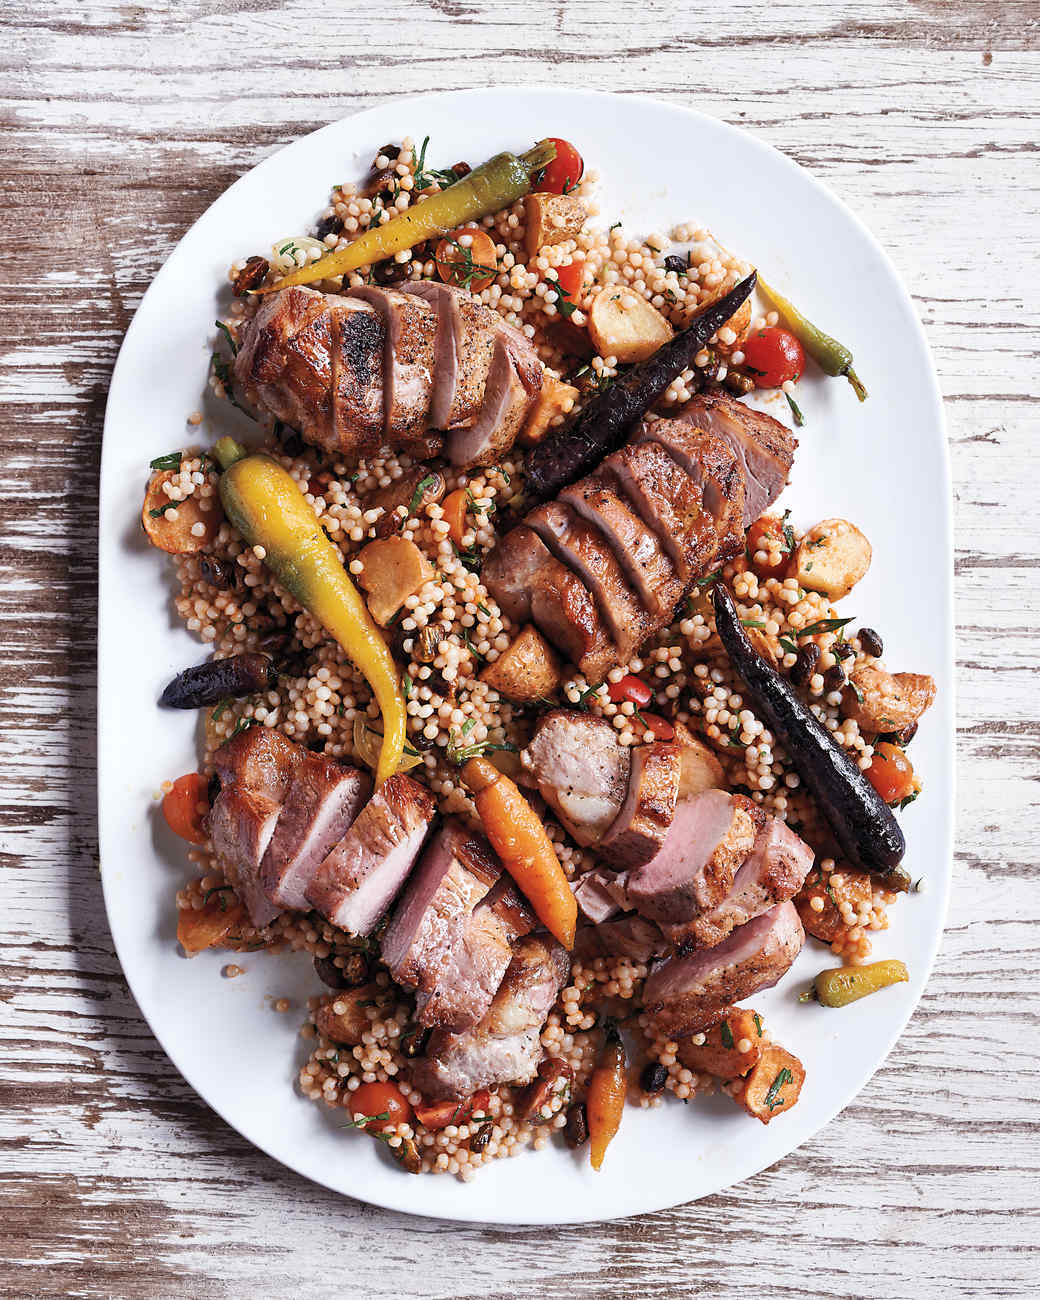 wyebrook-farm-grilled-pork-couscous-carrots-10-010-d111590.jpg